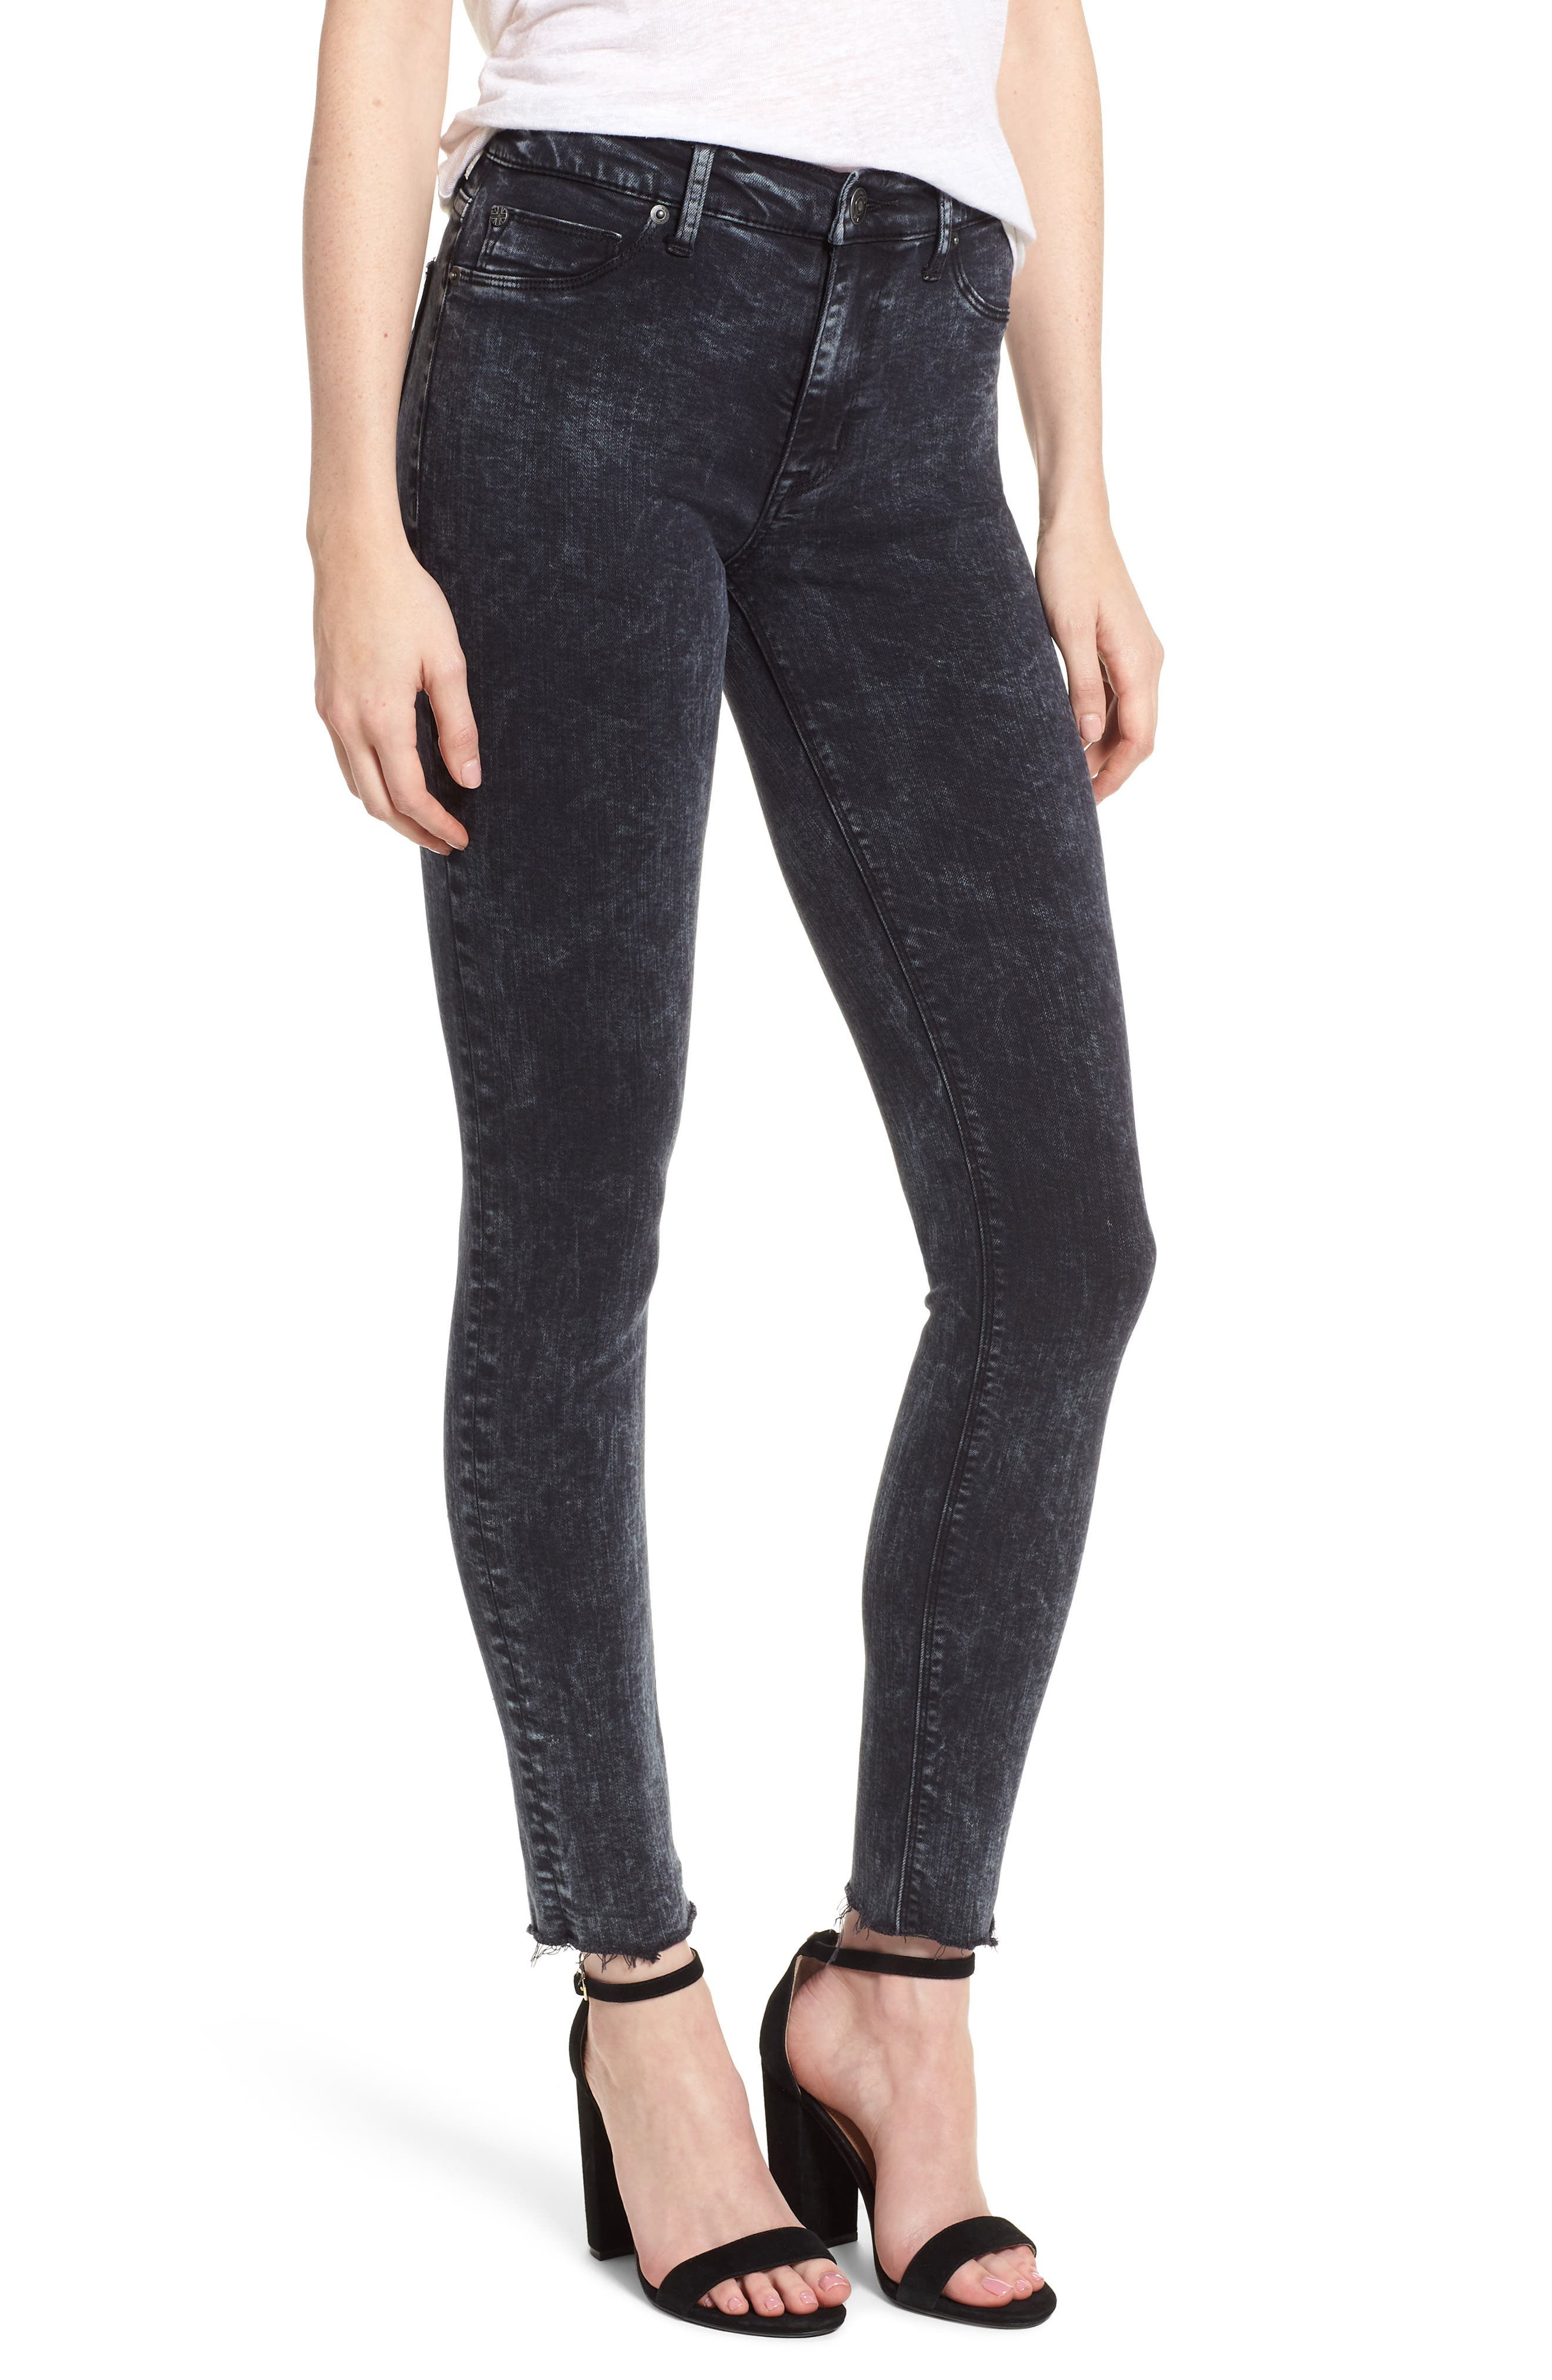 Barbara High Waist Ankle Skinny Jeans,                             Main thumbnail 1, color,                             Dainty